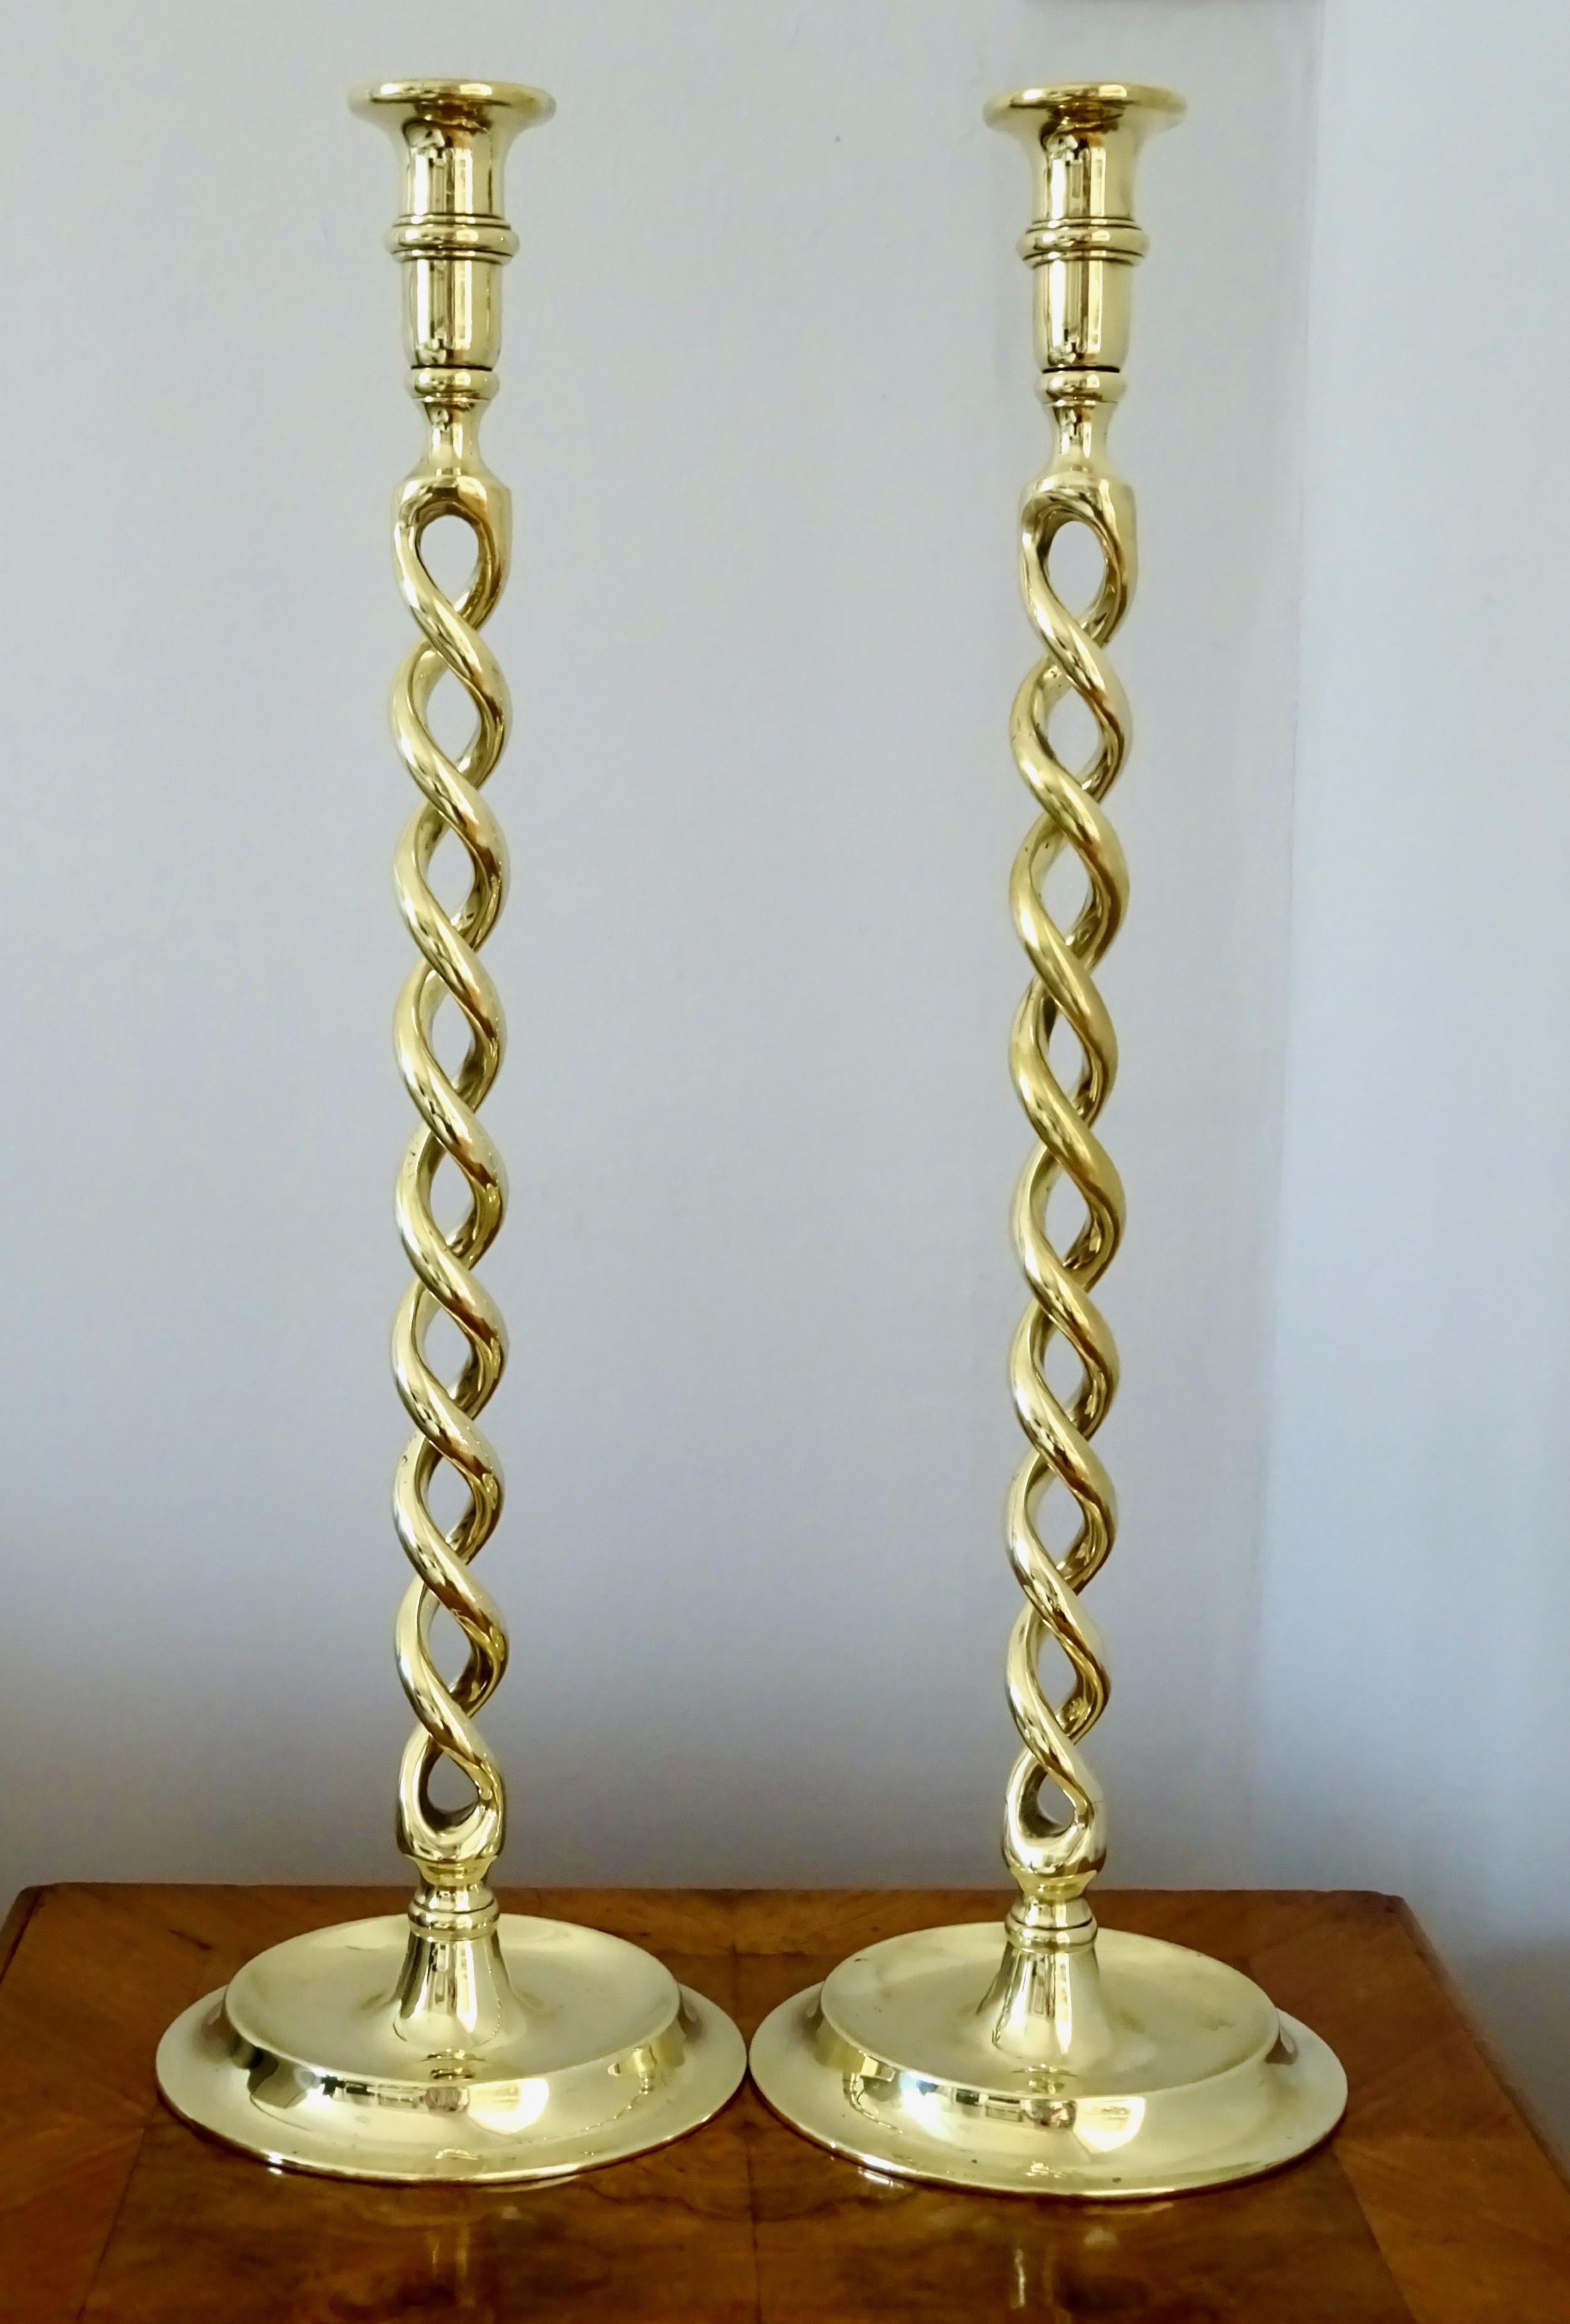 exceptionally tall brass candlesticks